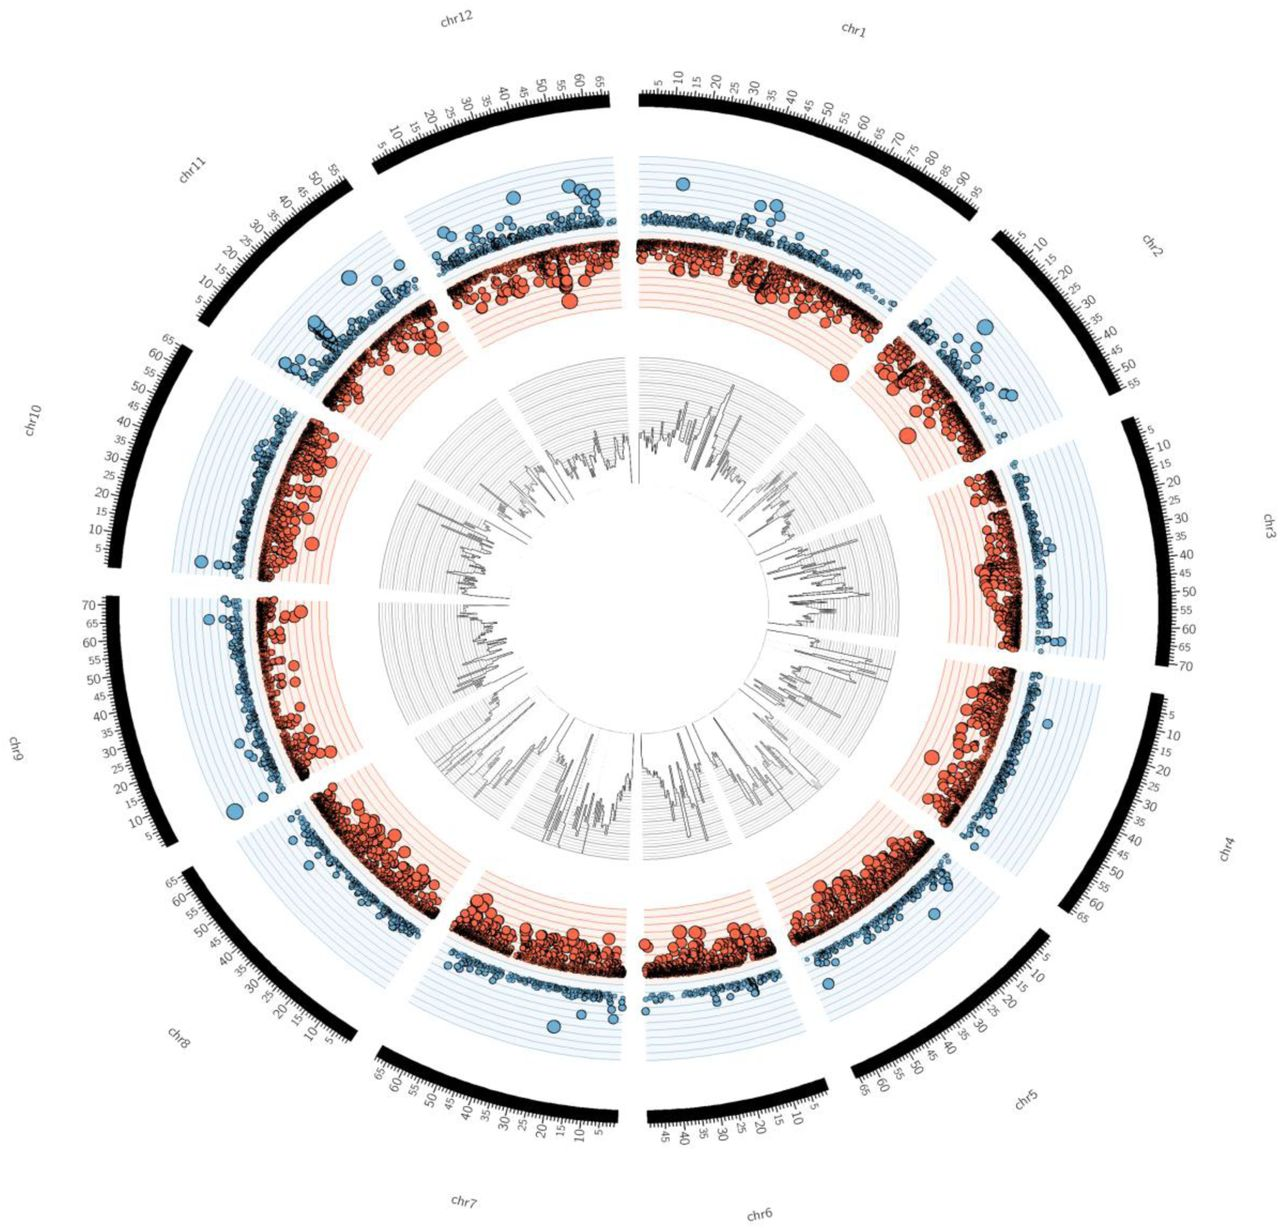 The genome sequence of the wild tomato Solanum pimpinellifolium